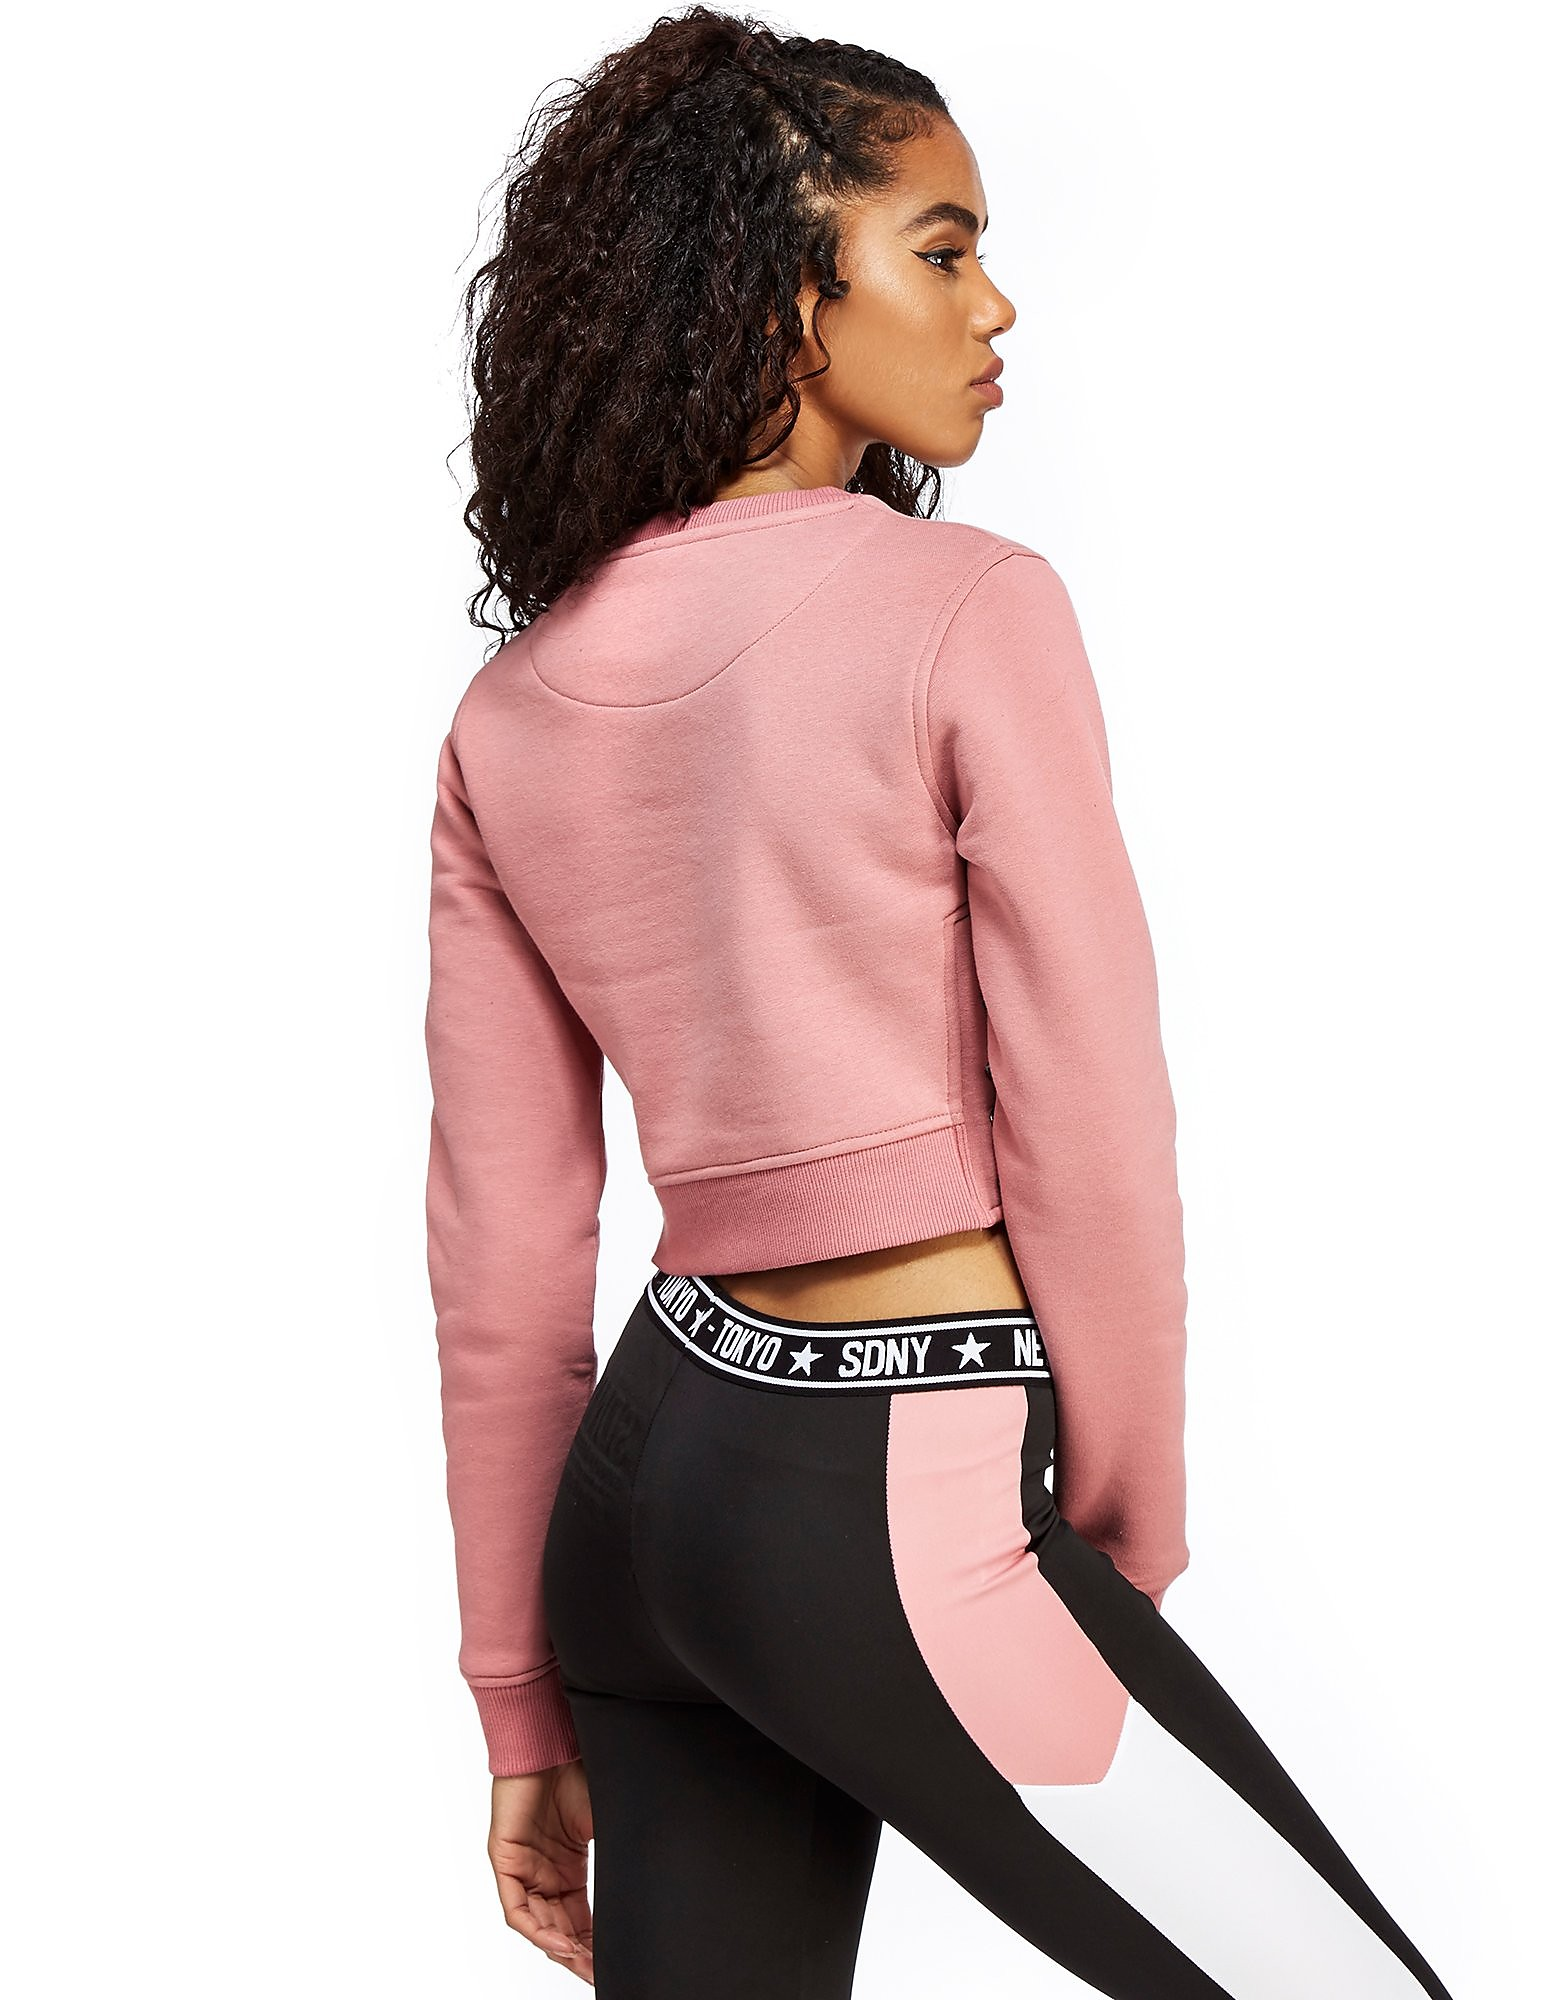 Supply & Demand Lace Crop Crew Sweatshirt